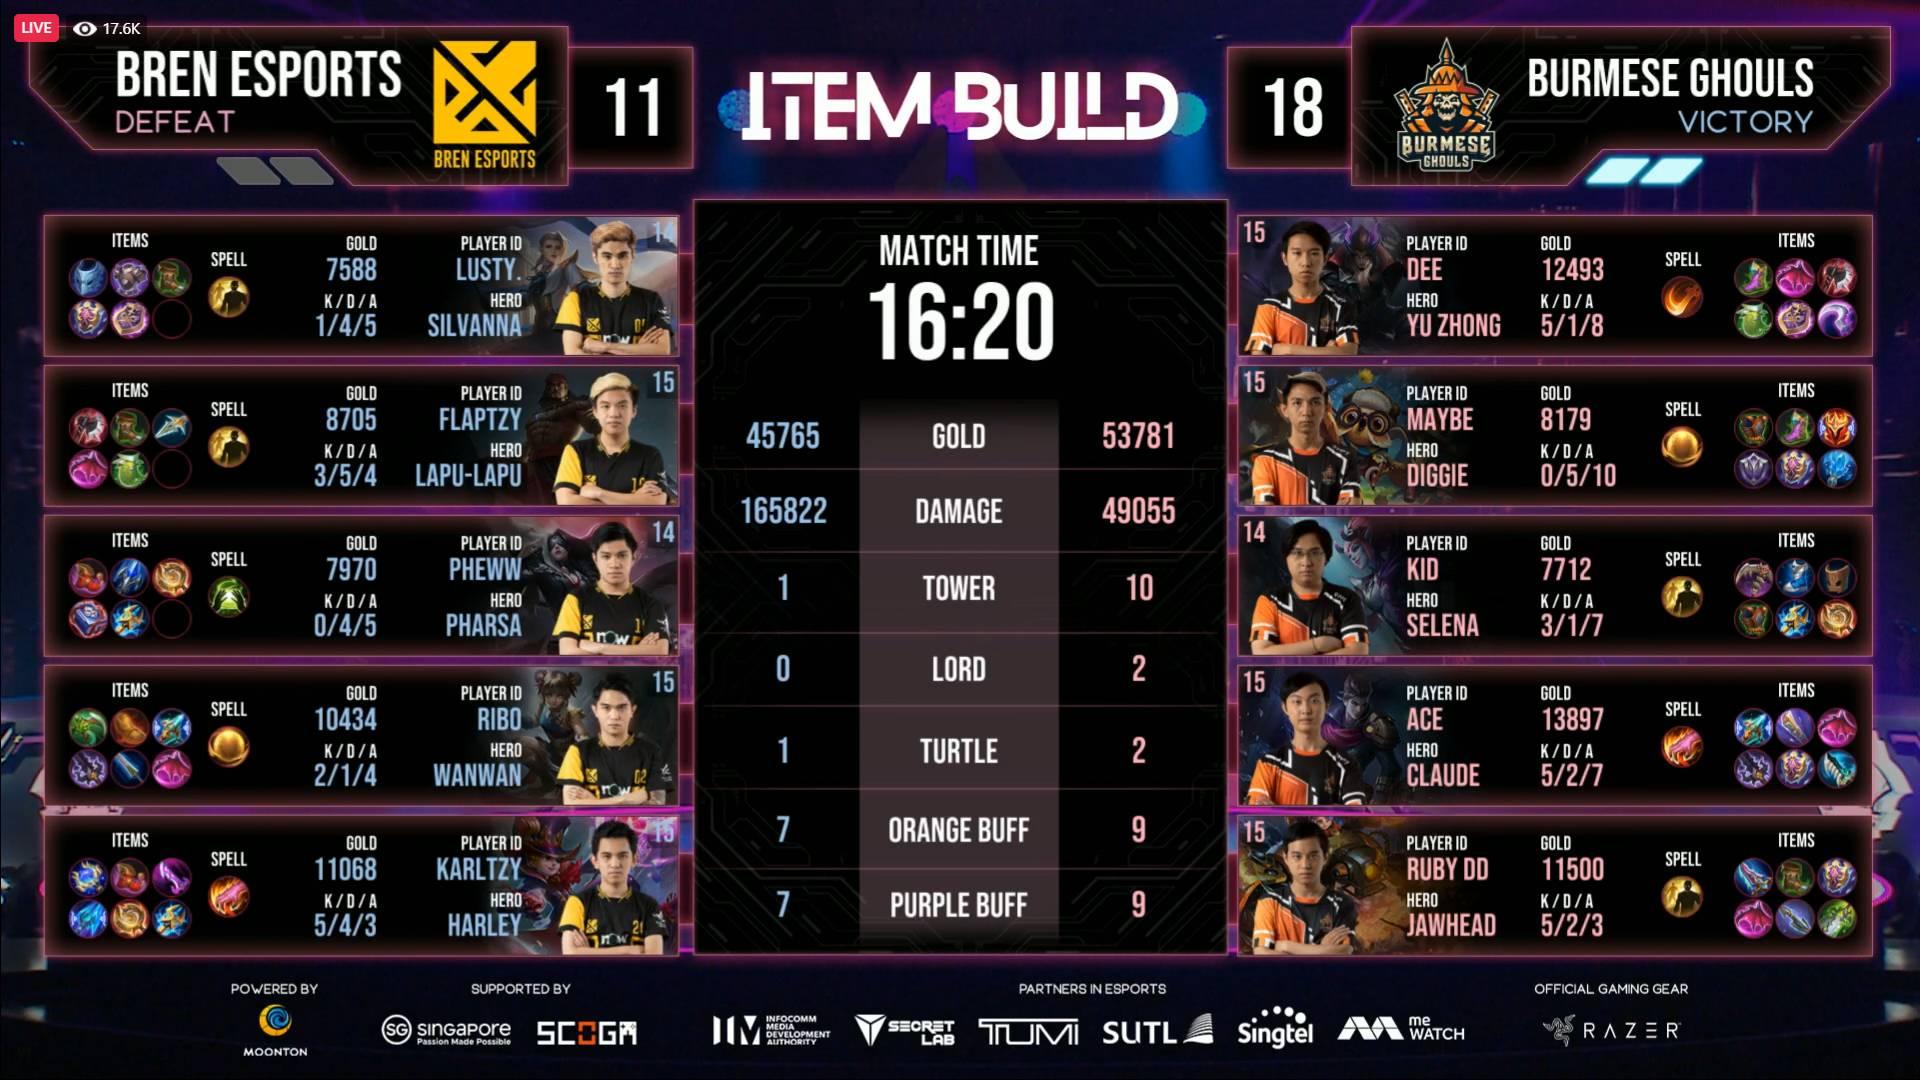 2021-M2-World-Championship-Burmese-Ghoul-def-Bren-Game-Two-stats BREN Esports sent crashing to M2 Lower Bracket ESports Mobile Legends MPL-PH News  - philippine sports news